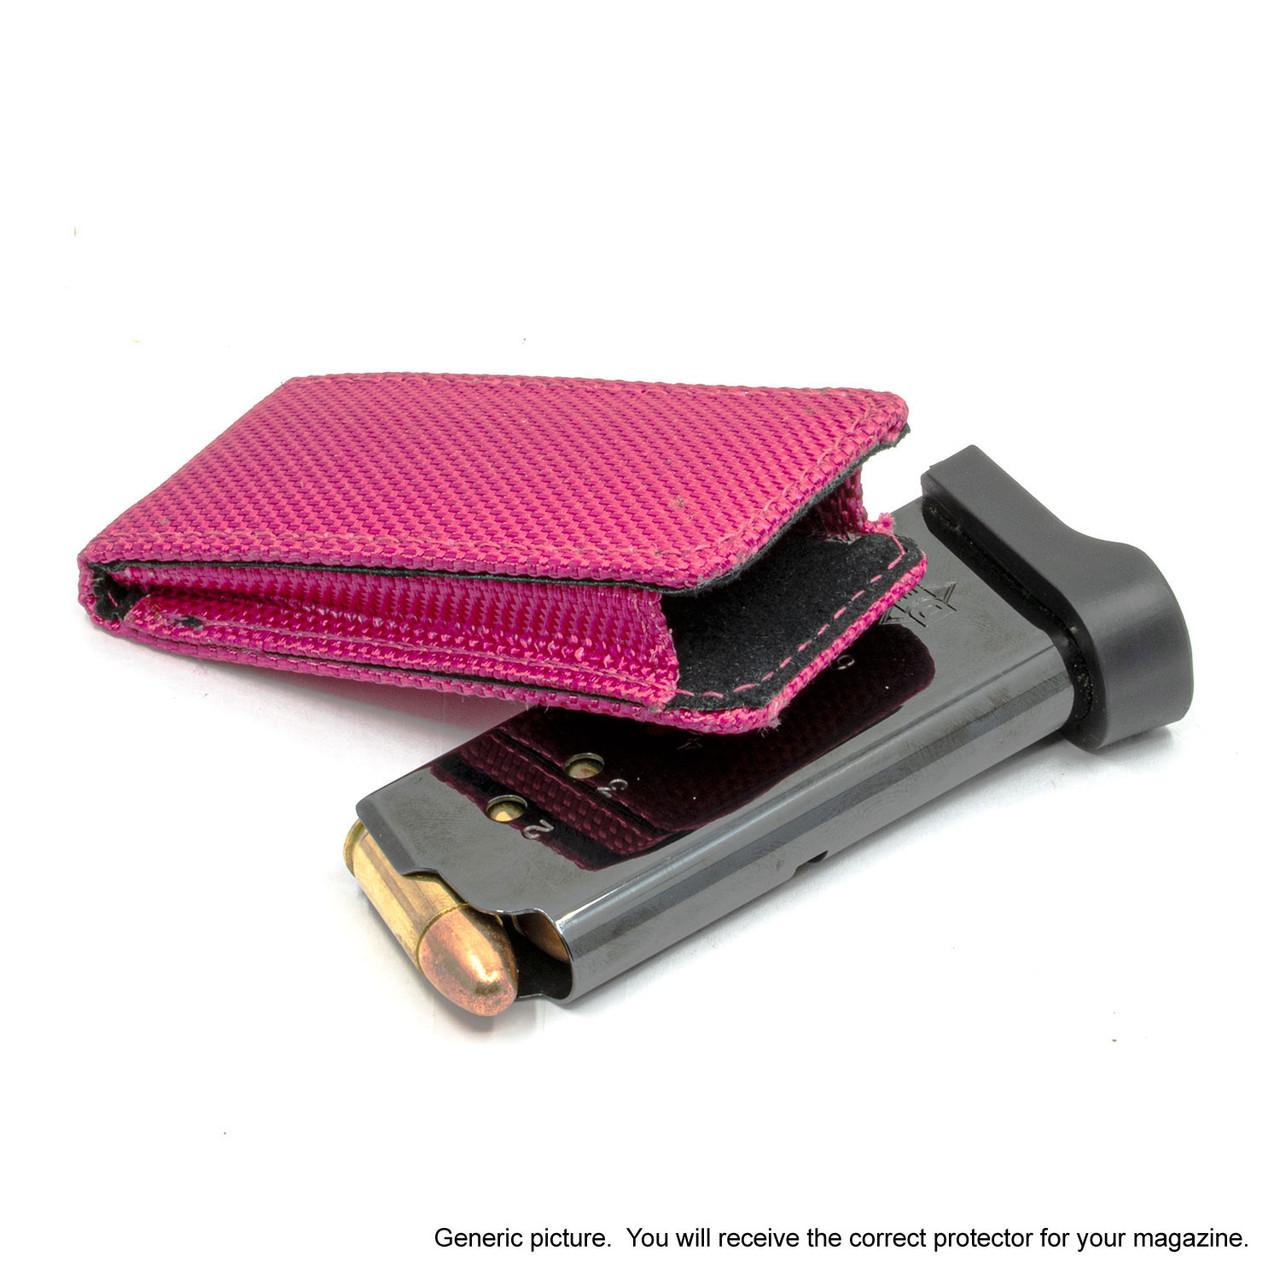 Beretta APX Pink Covert Magazine Pocket Protector